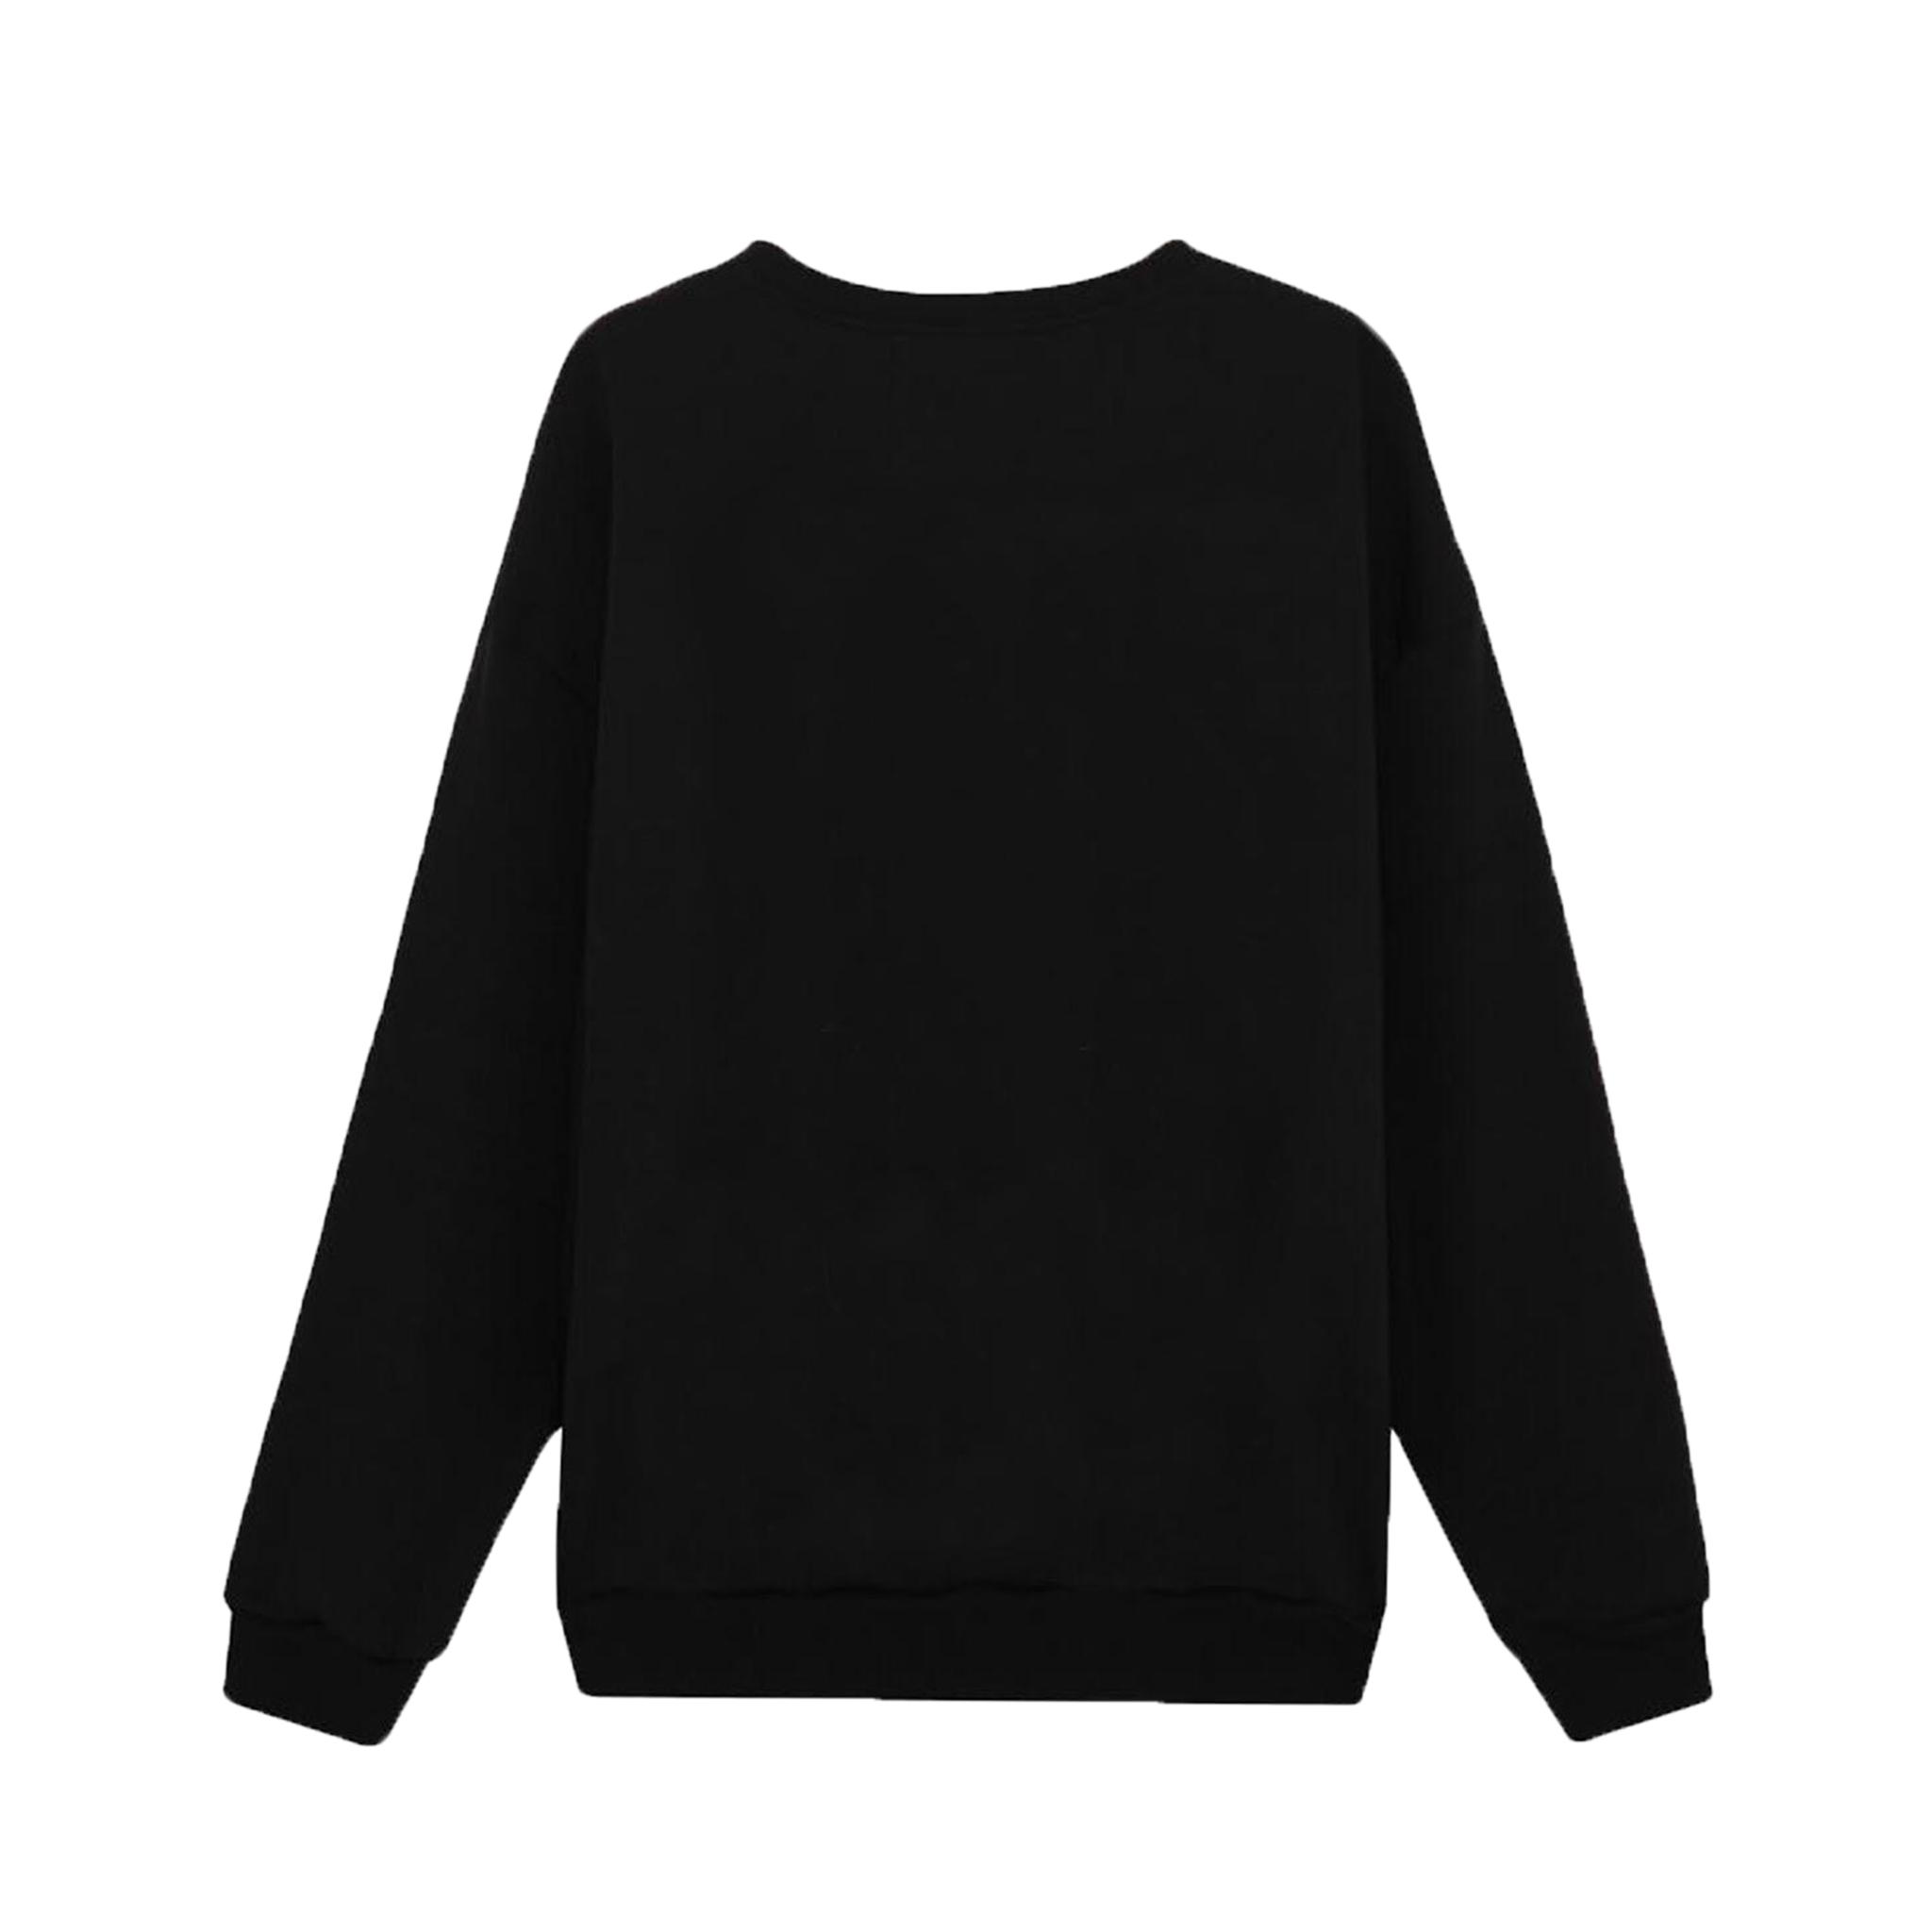 CASSETTE SWEATER/BLACK